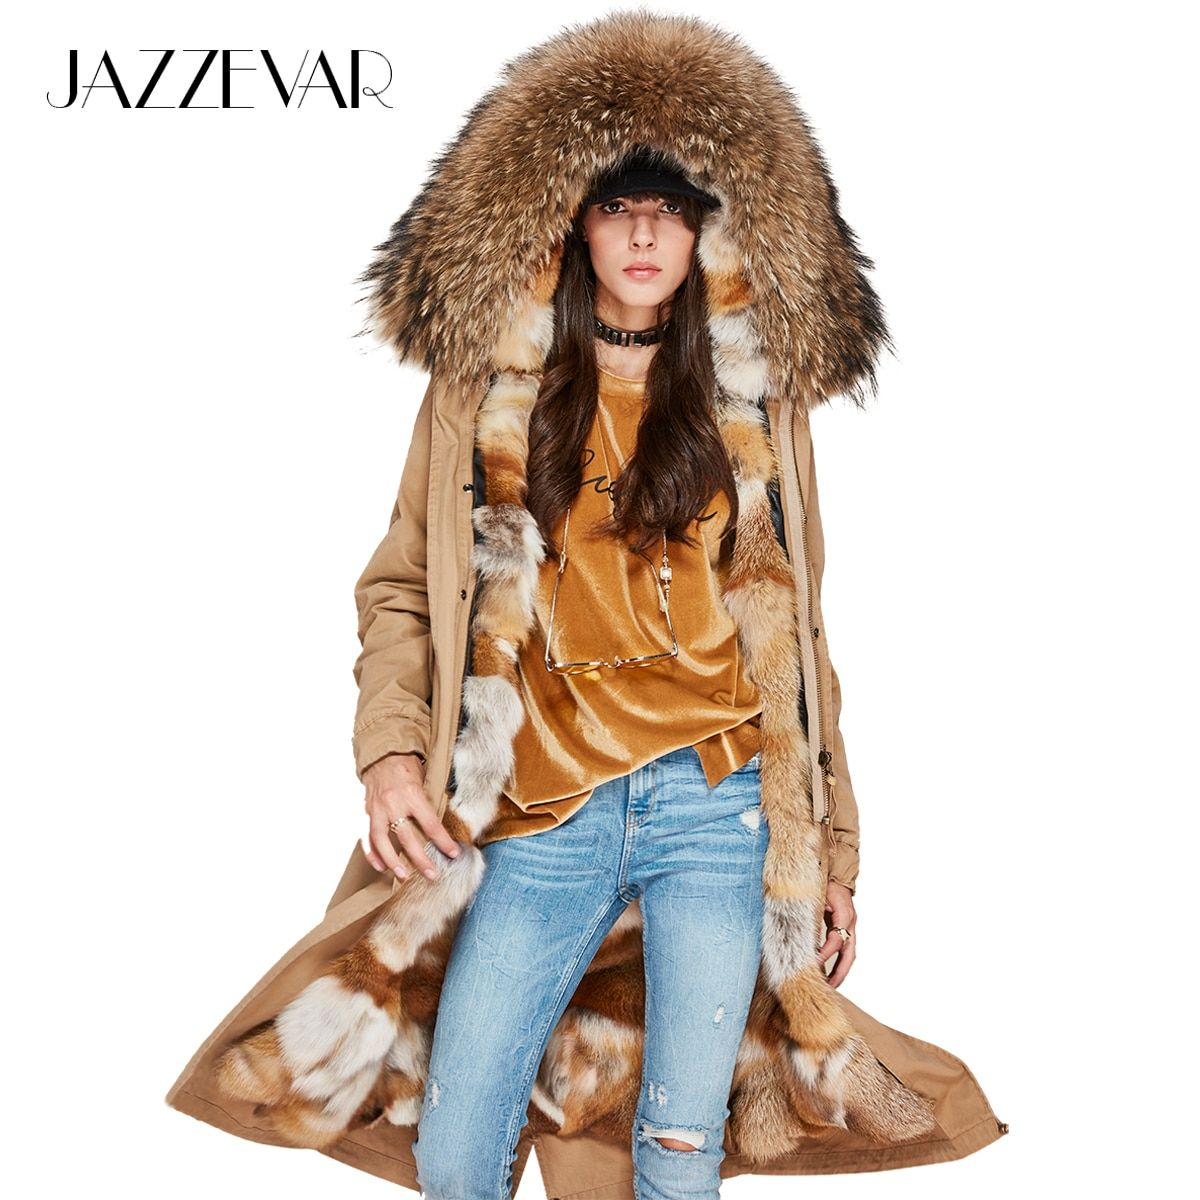 JAZZEVAR 2018 New Winter Fashion Woman Luxurious Real Fox fur lining X-Long Parka Large Raccoon fur Hooded Coat Military Jacket